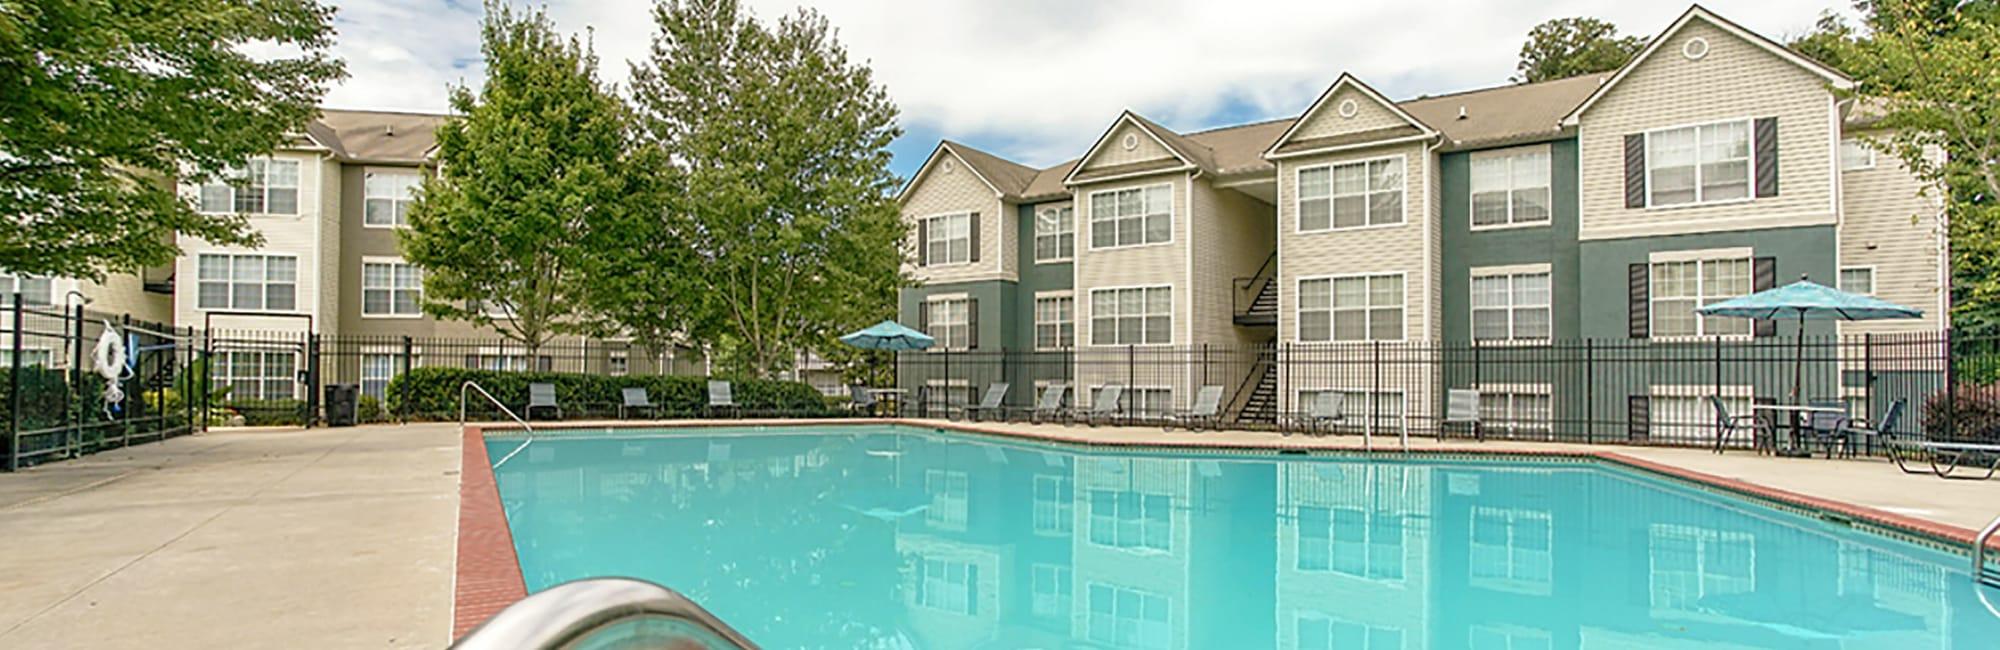 Apartments at Monterey Village in Jonesboro, Georgia